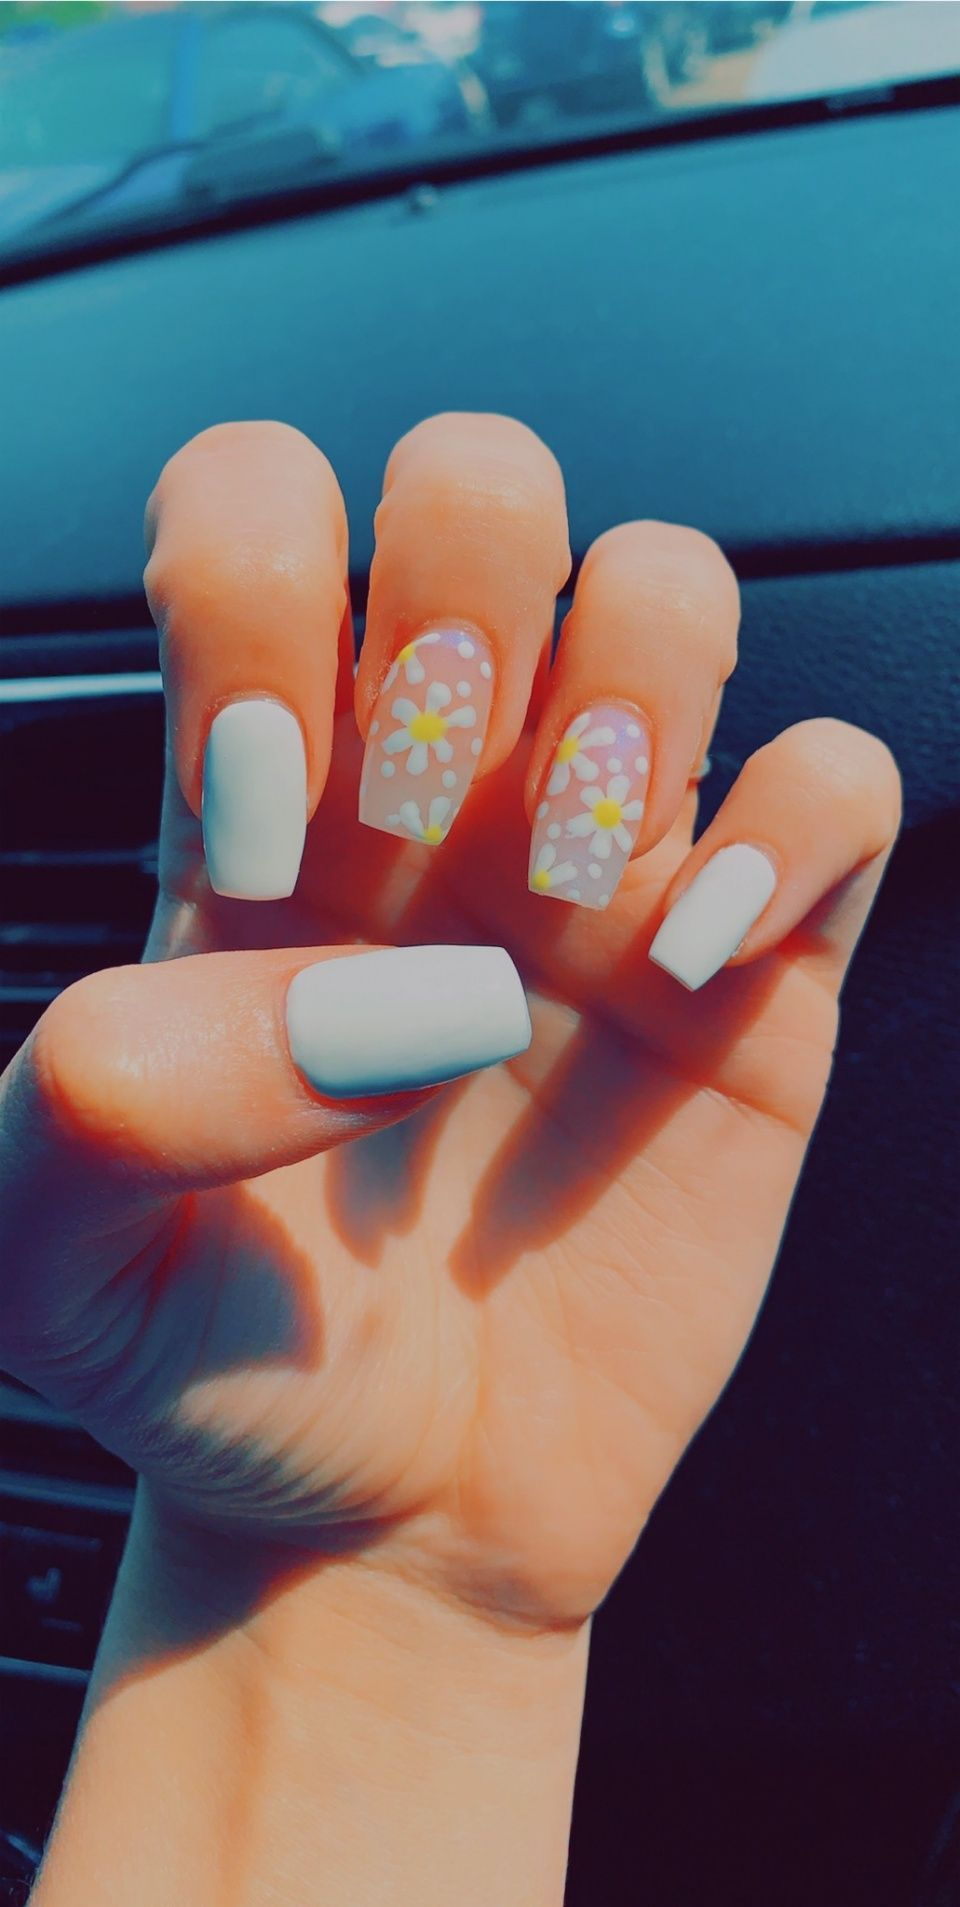 diva nails 6th and havana  Diva Nails havana Diva DivaNails